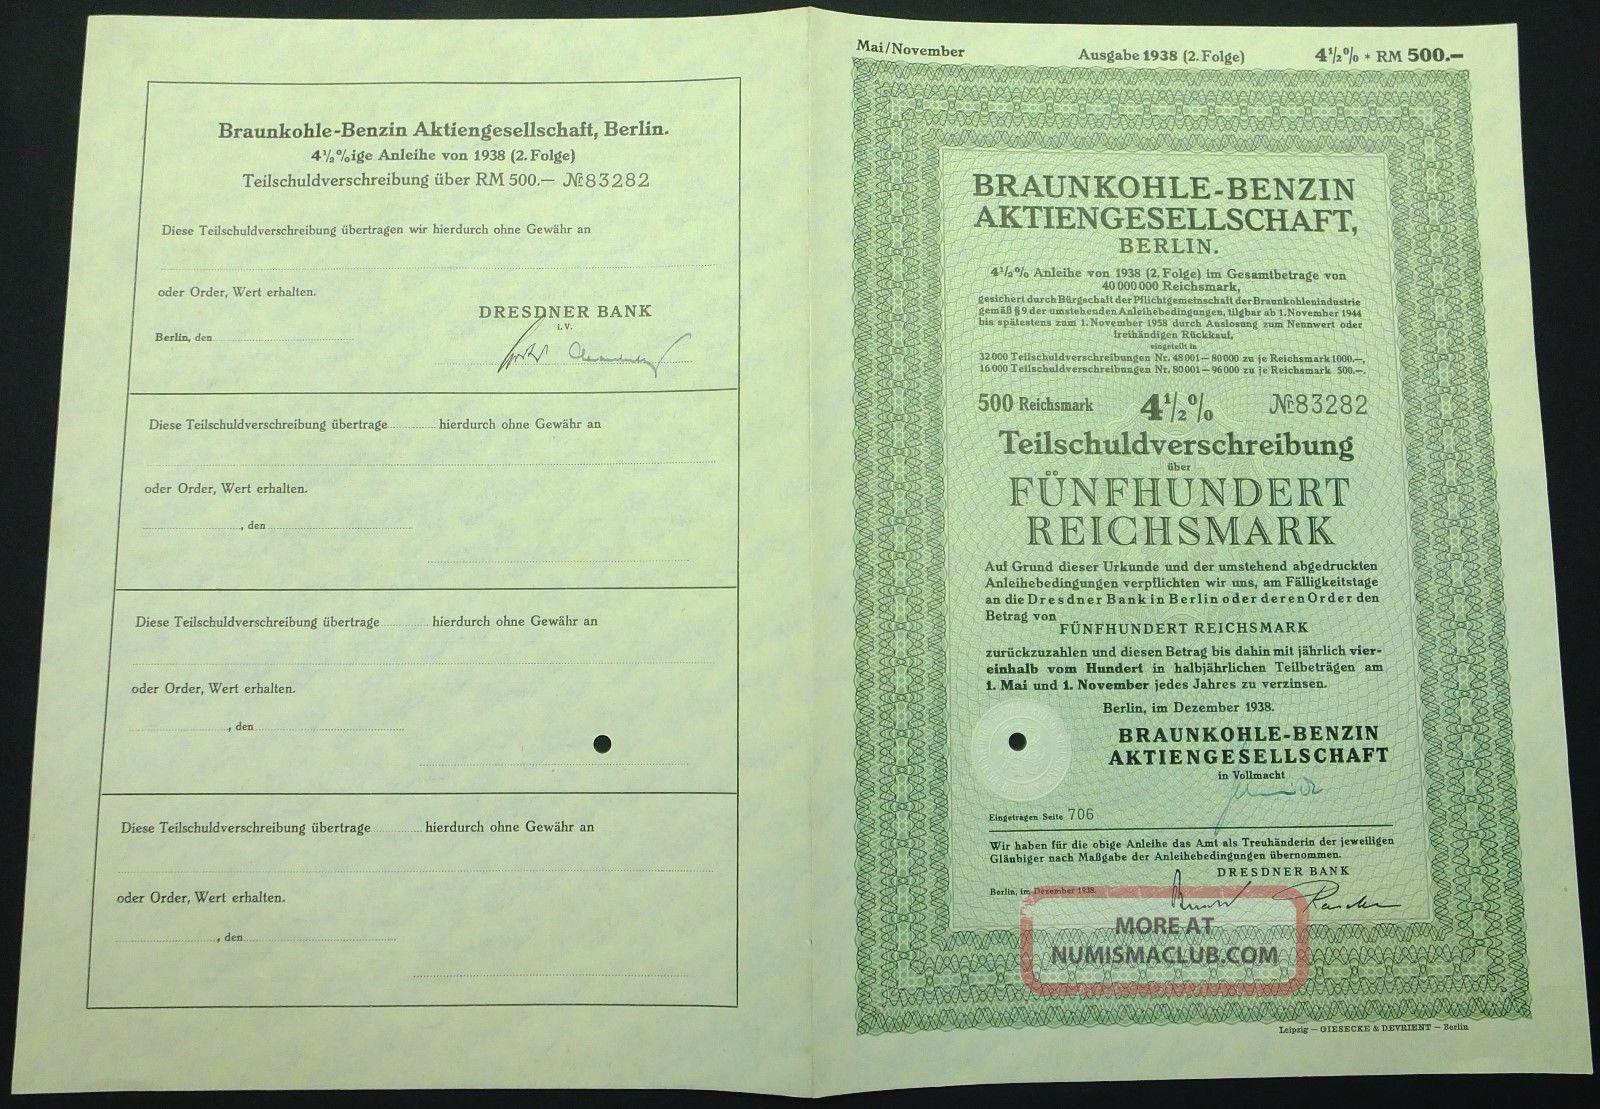 Braunkohle - Benzin Ag,  Berlin 12/1938 4 1/2 German Bond Certificate World photo